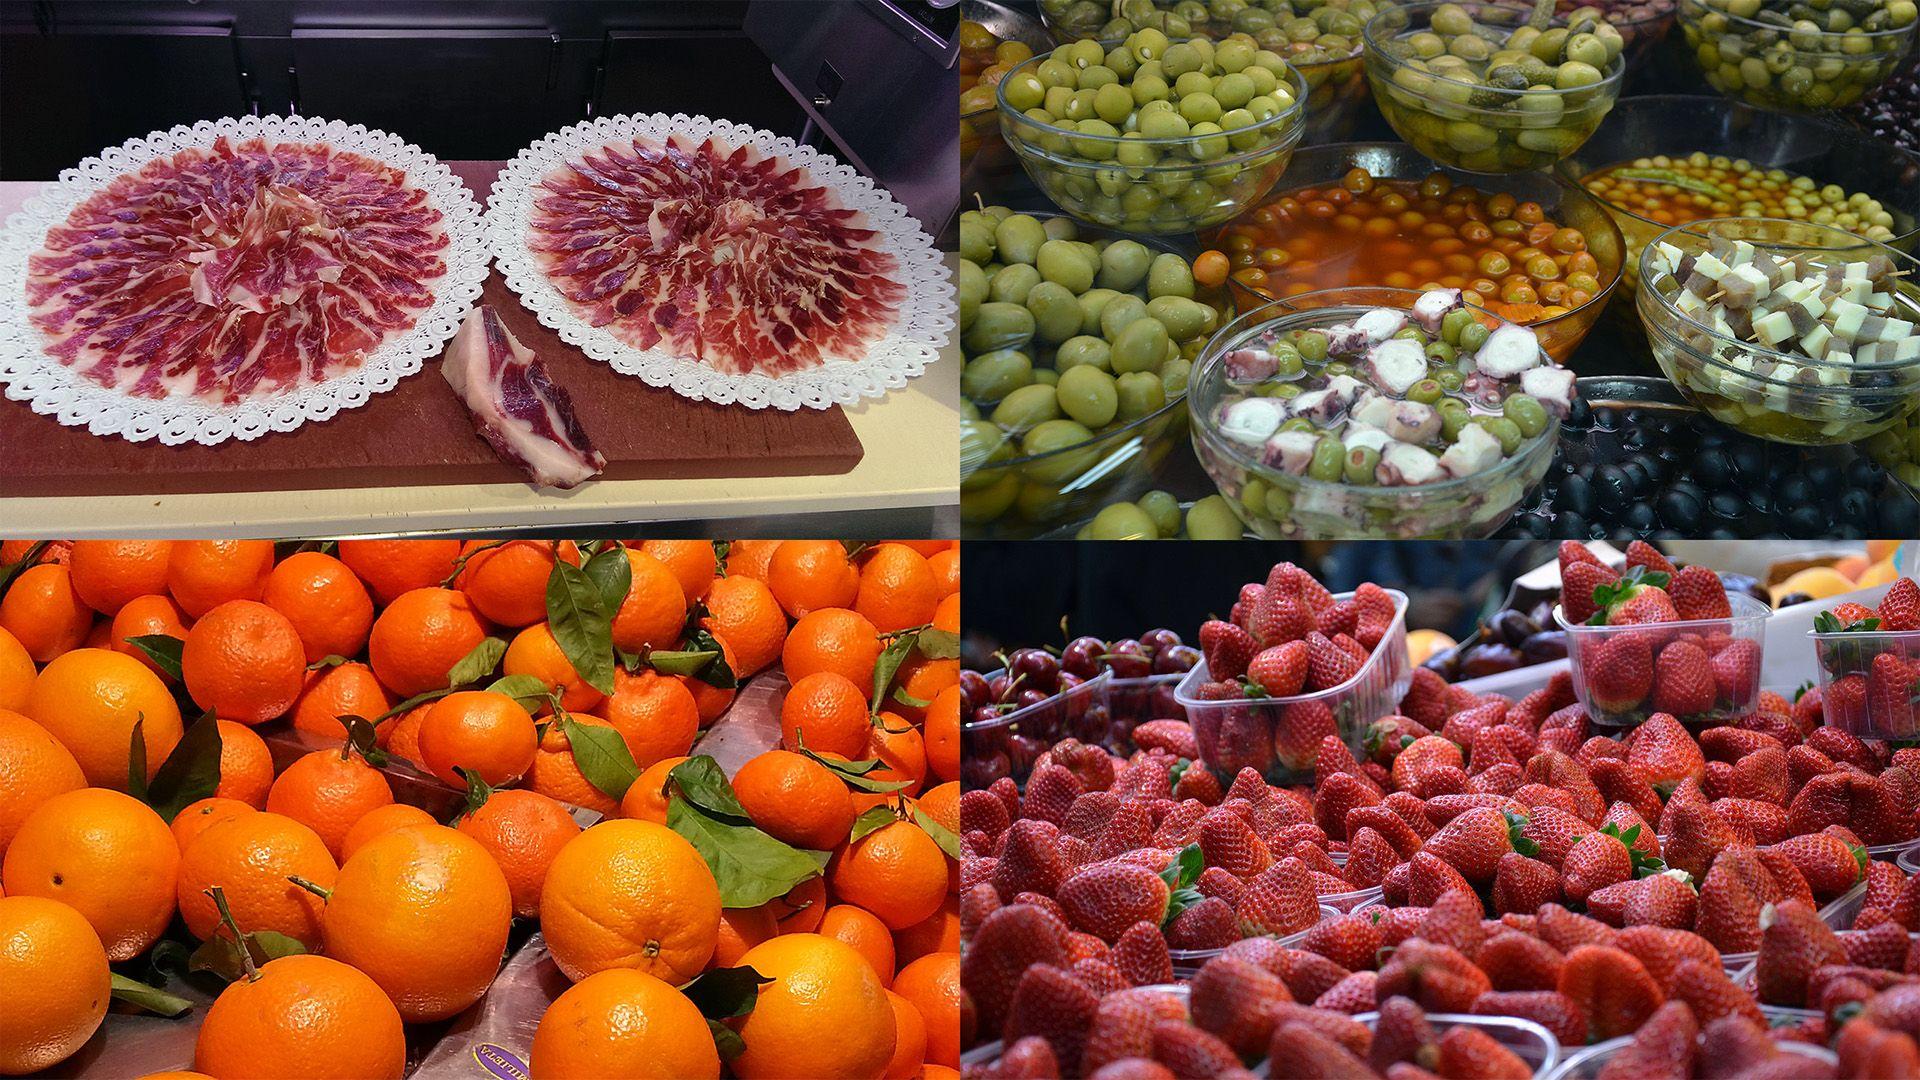 Gastronomic tour Valencia - the Central Market